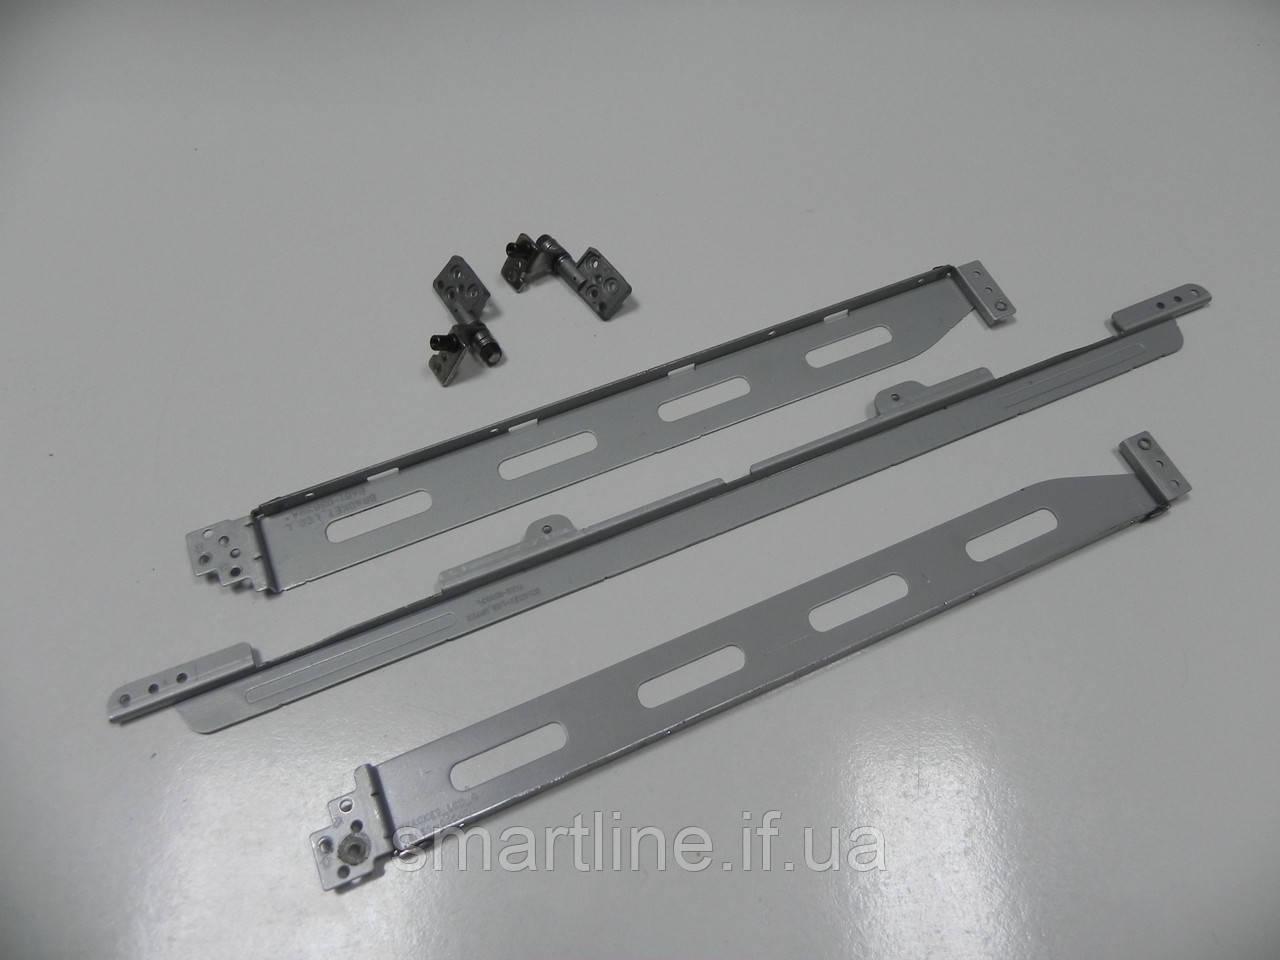 Петлі для ноутбука Samsung NP-R60, R60 plus, R58, BA81-03839A, BA81-03